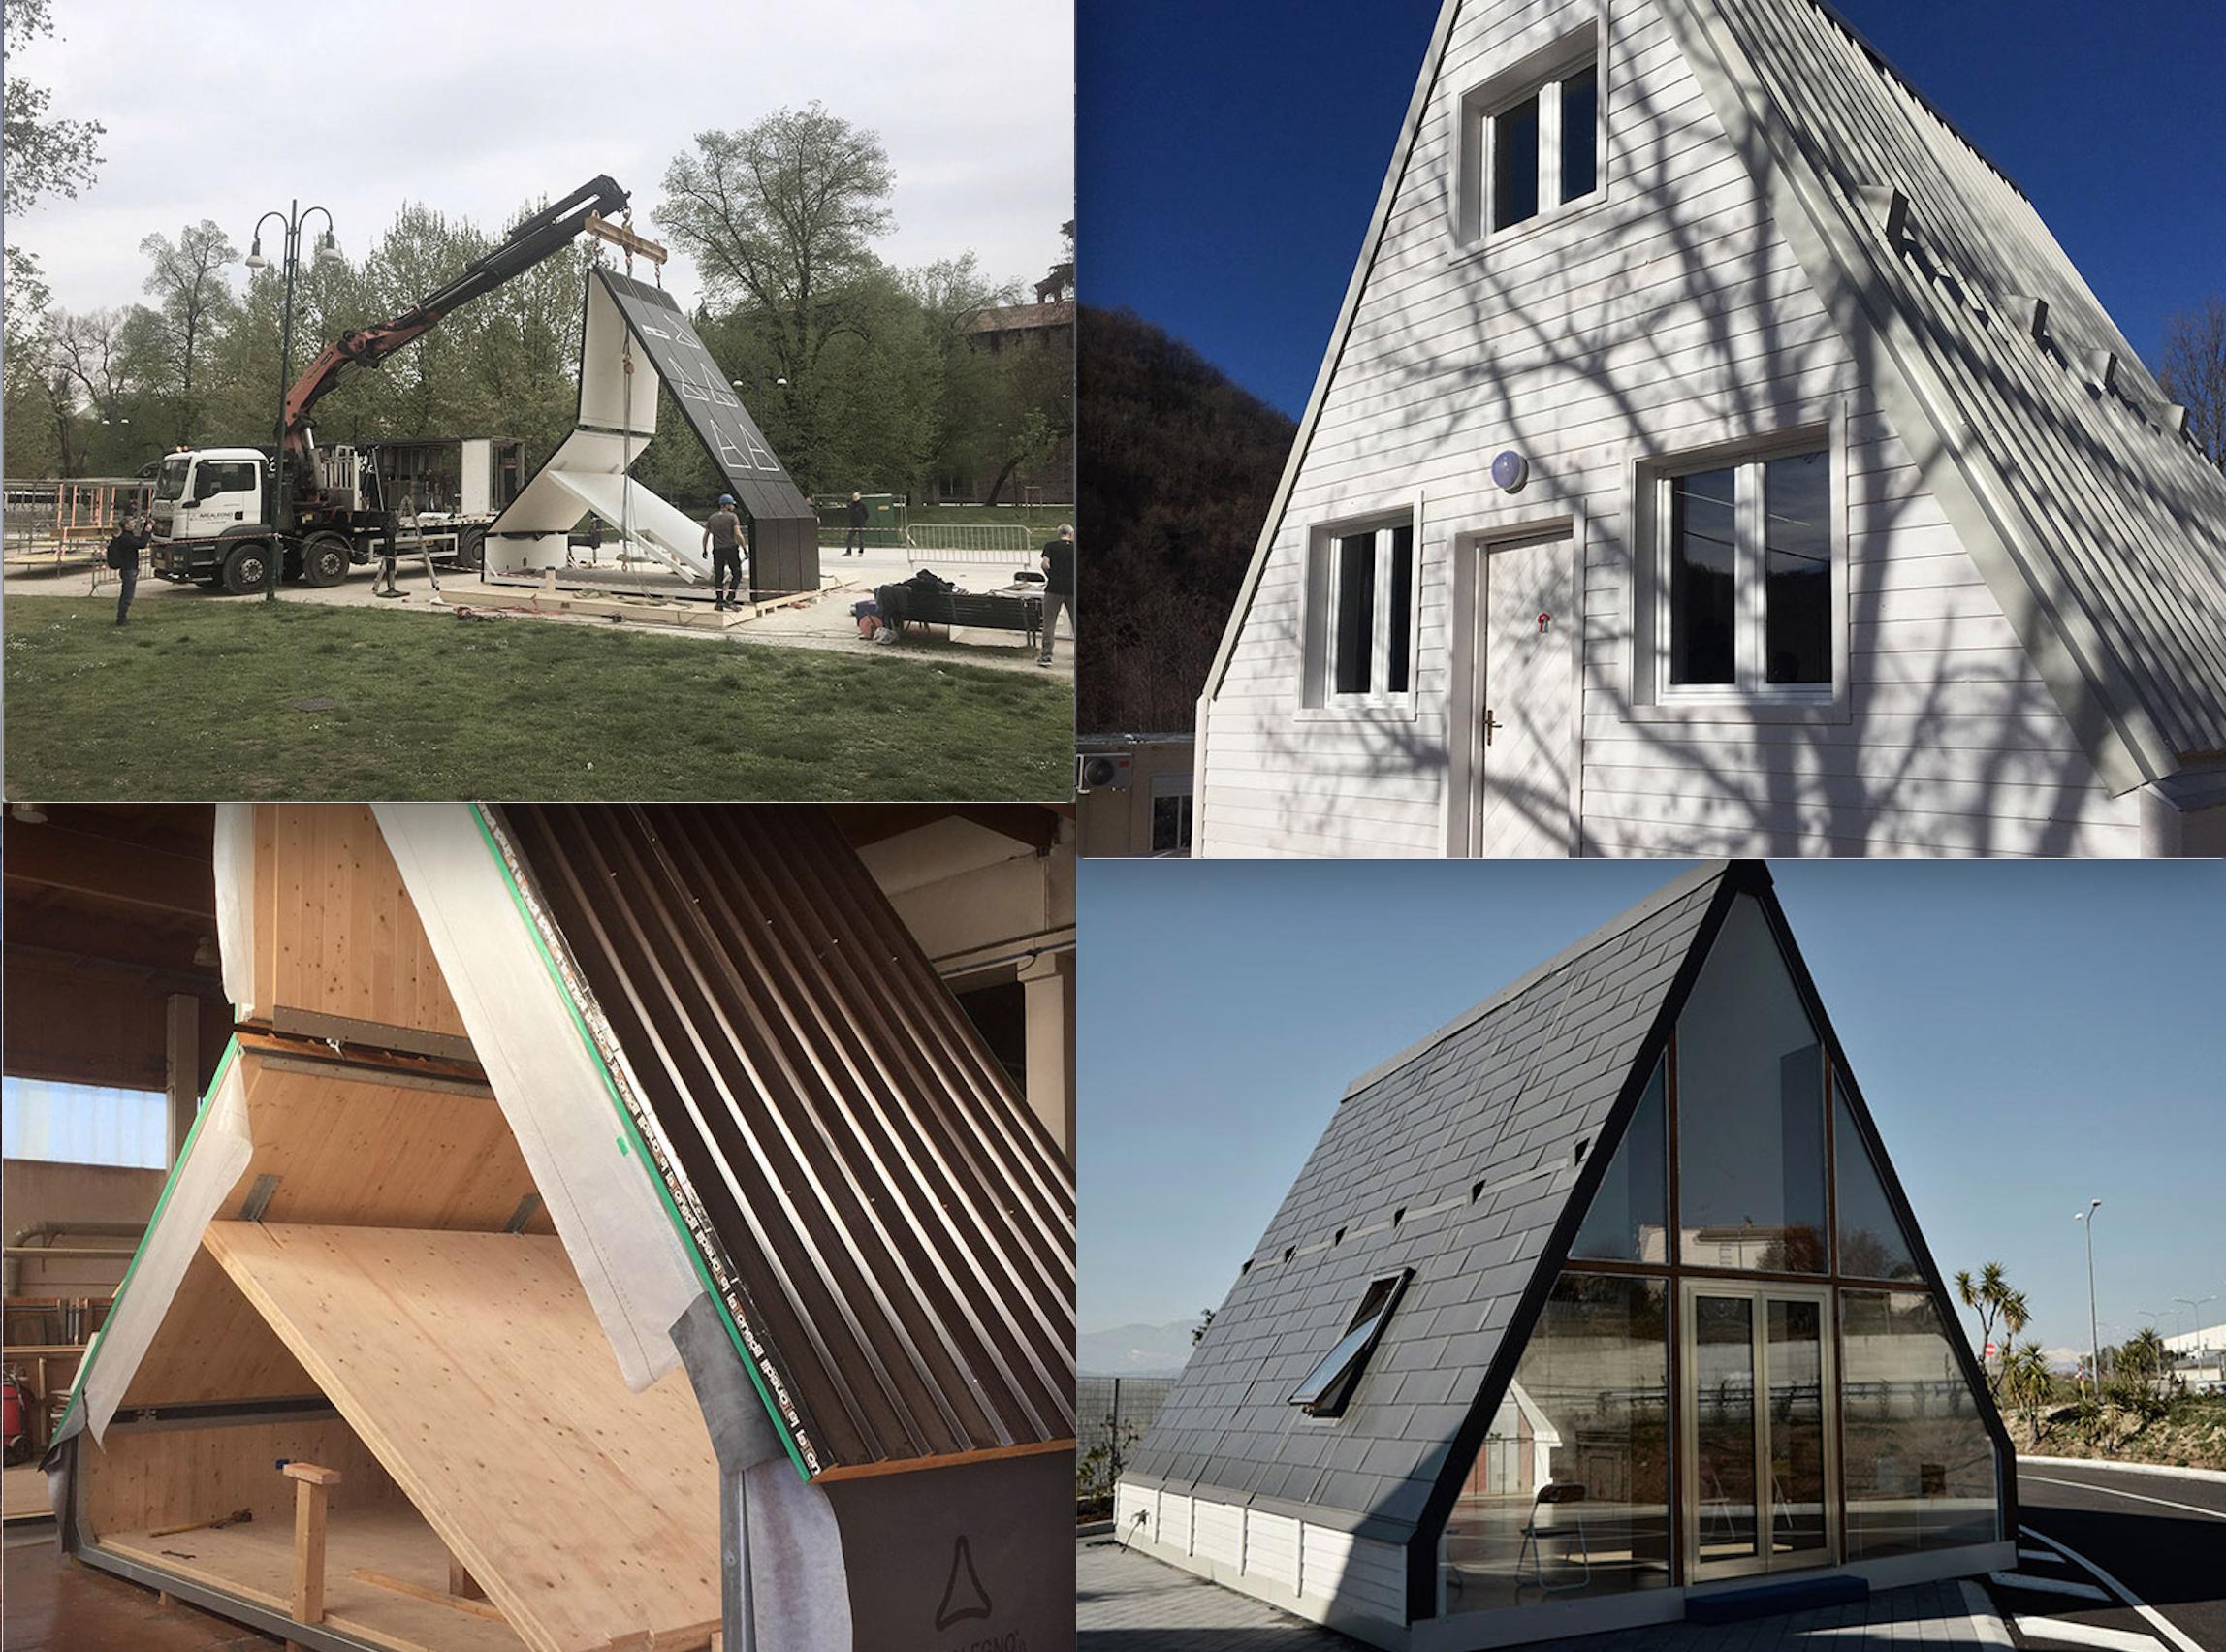 Foldable modular A-frame home